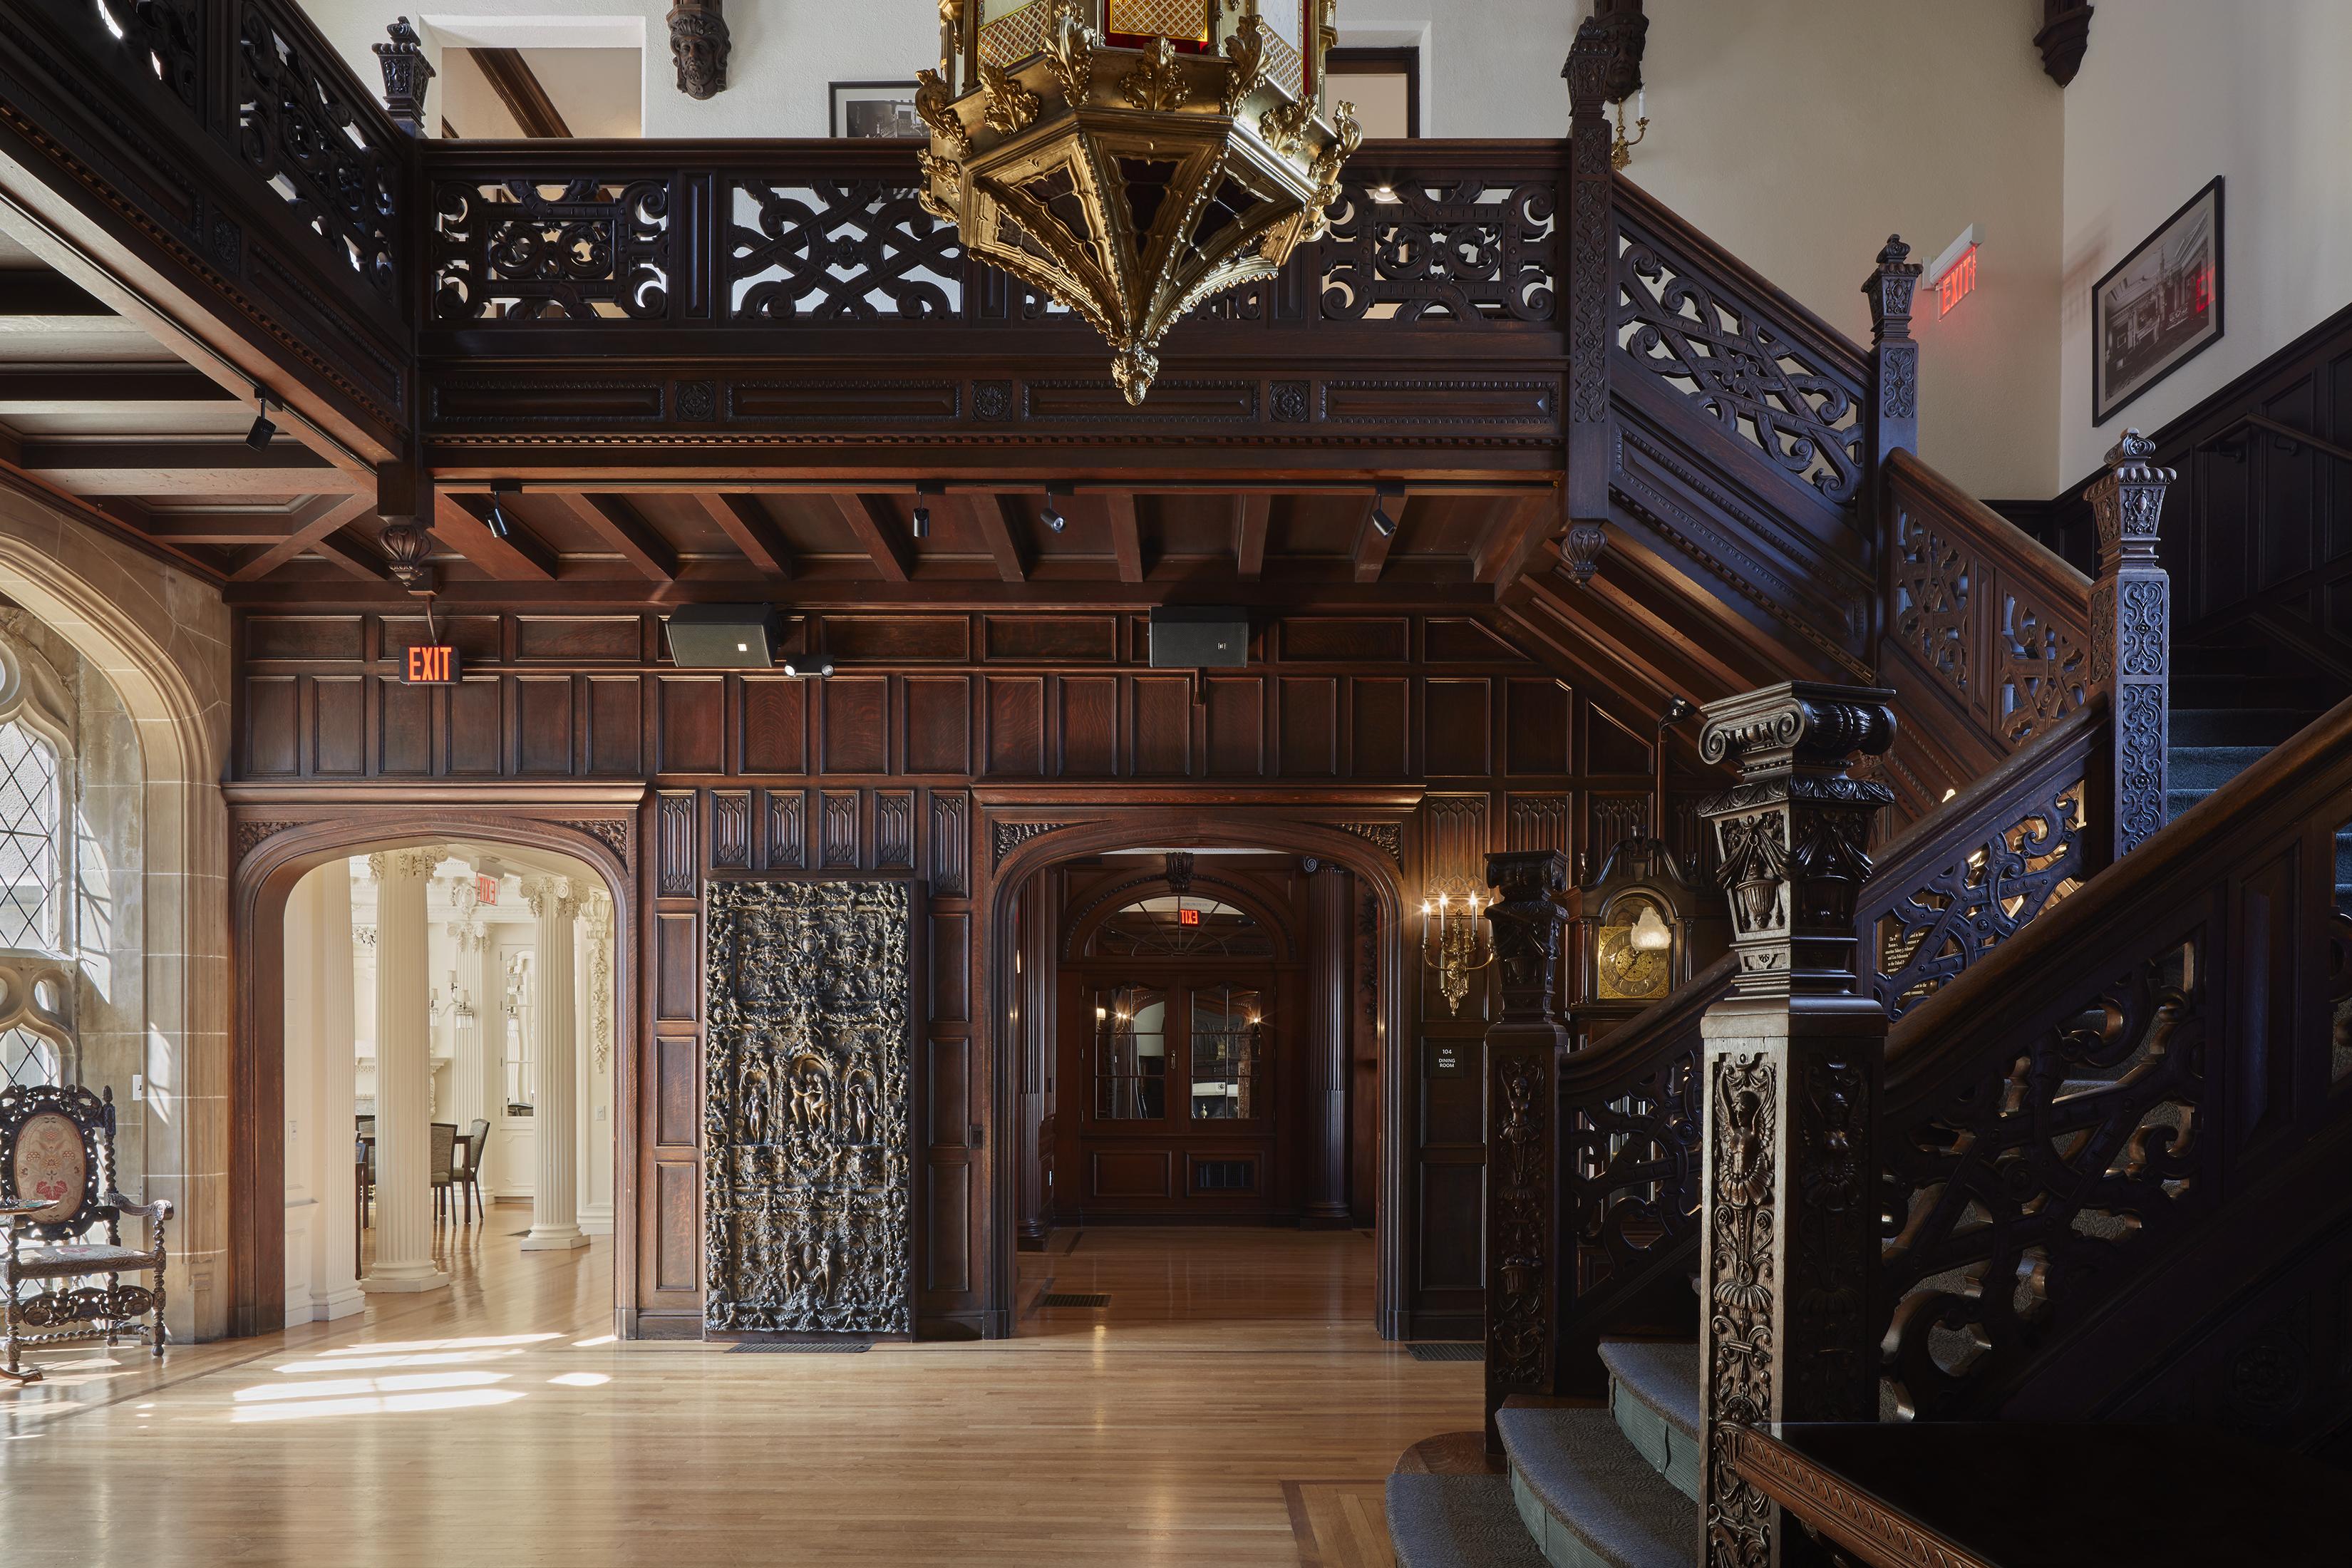 Boston University Castle restoration: Photos